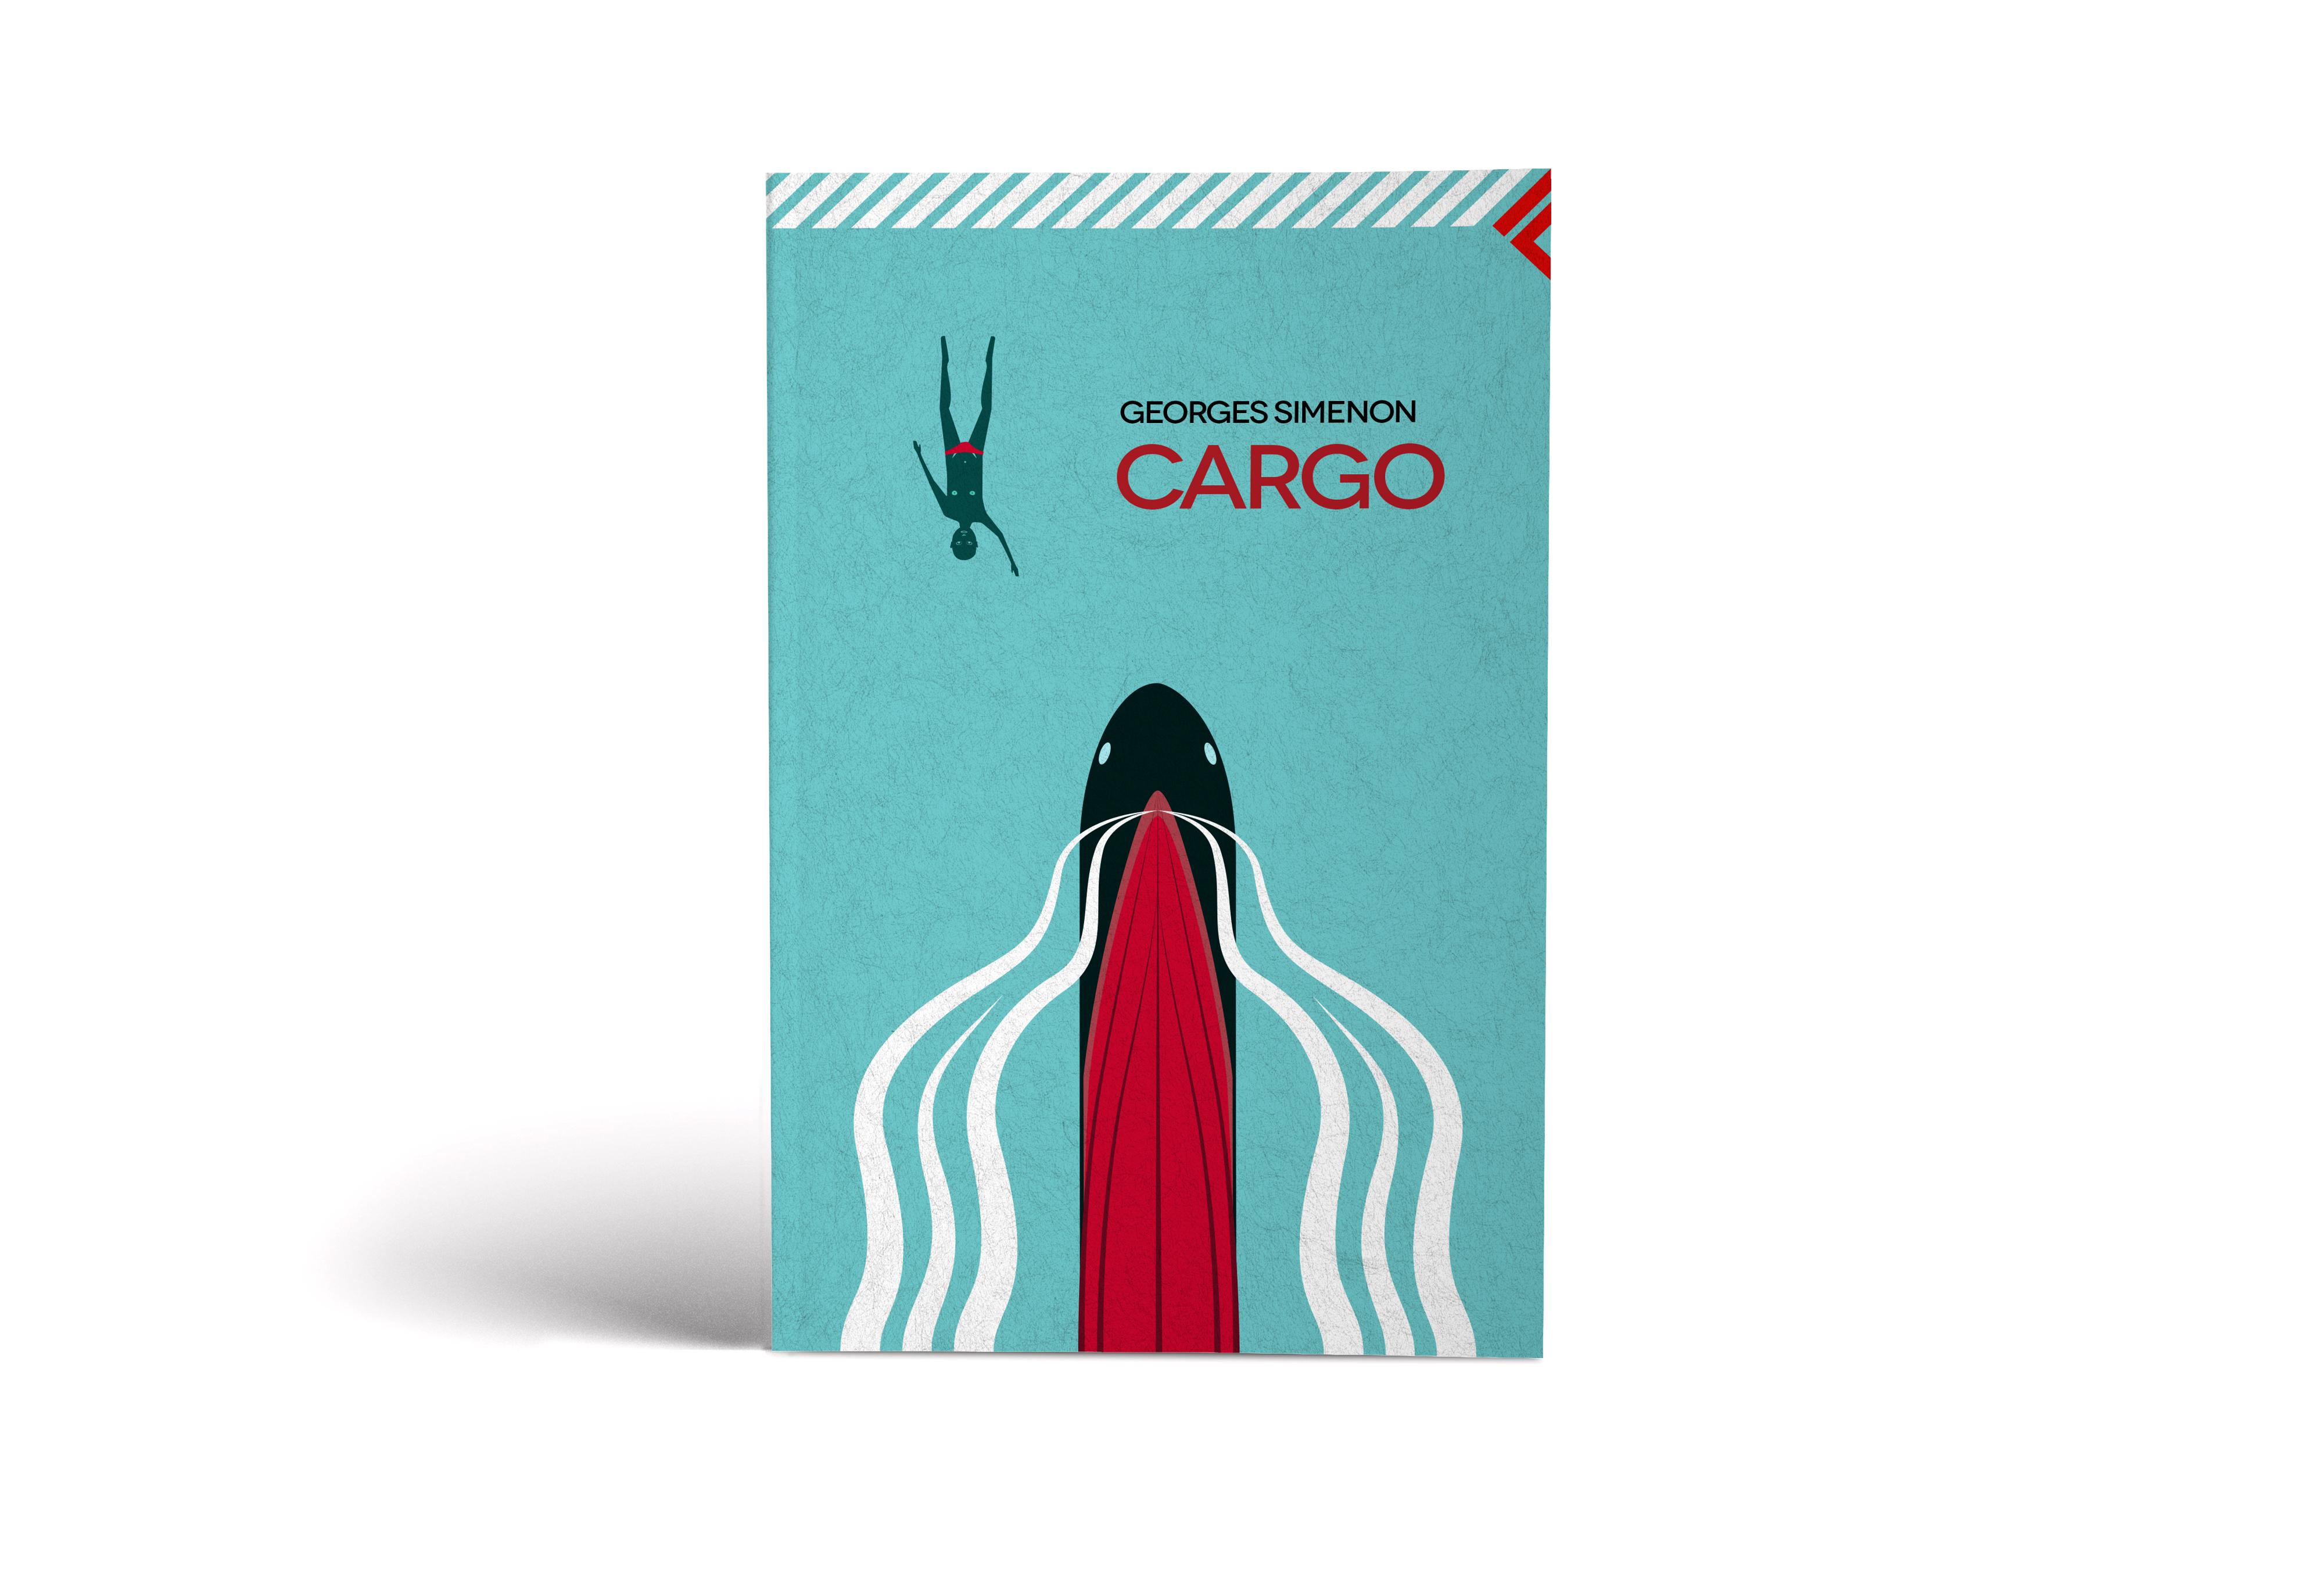 Mockup_copertina_1_Cargo